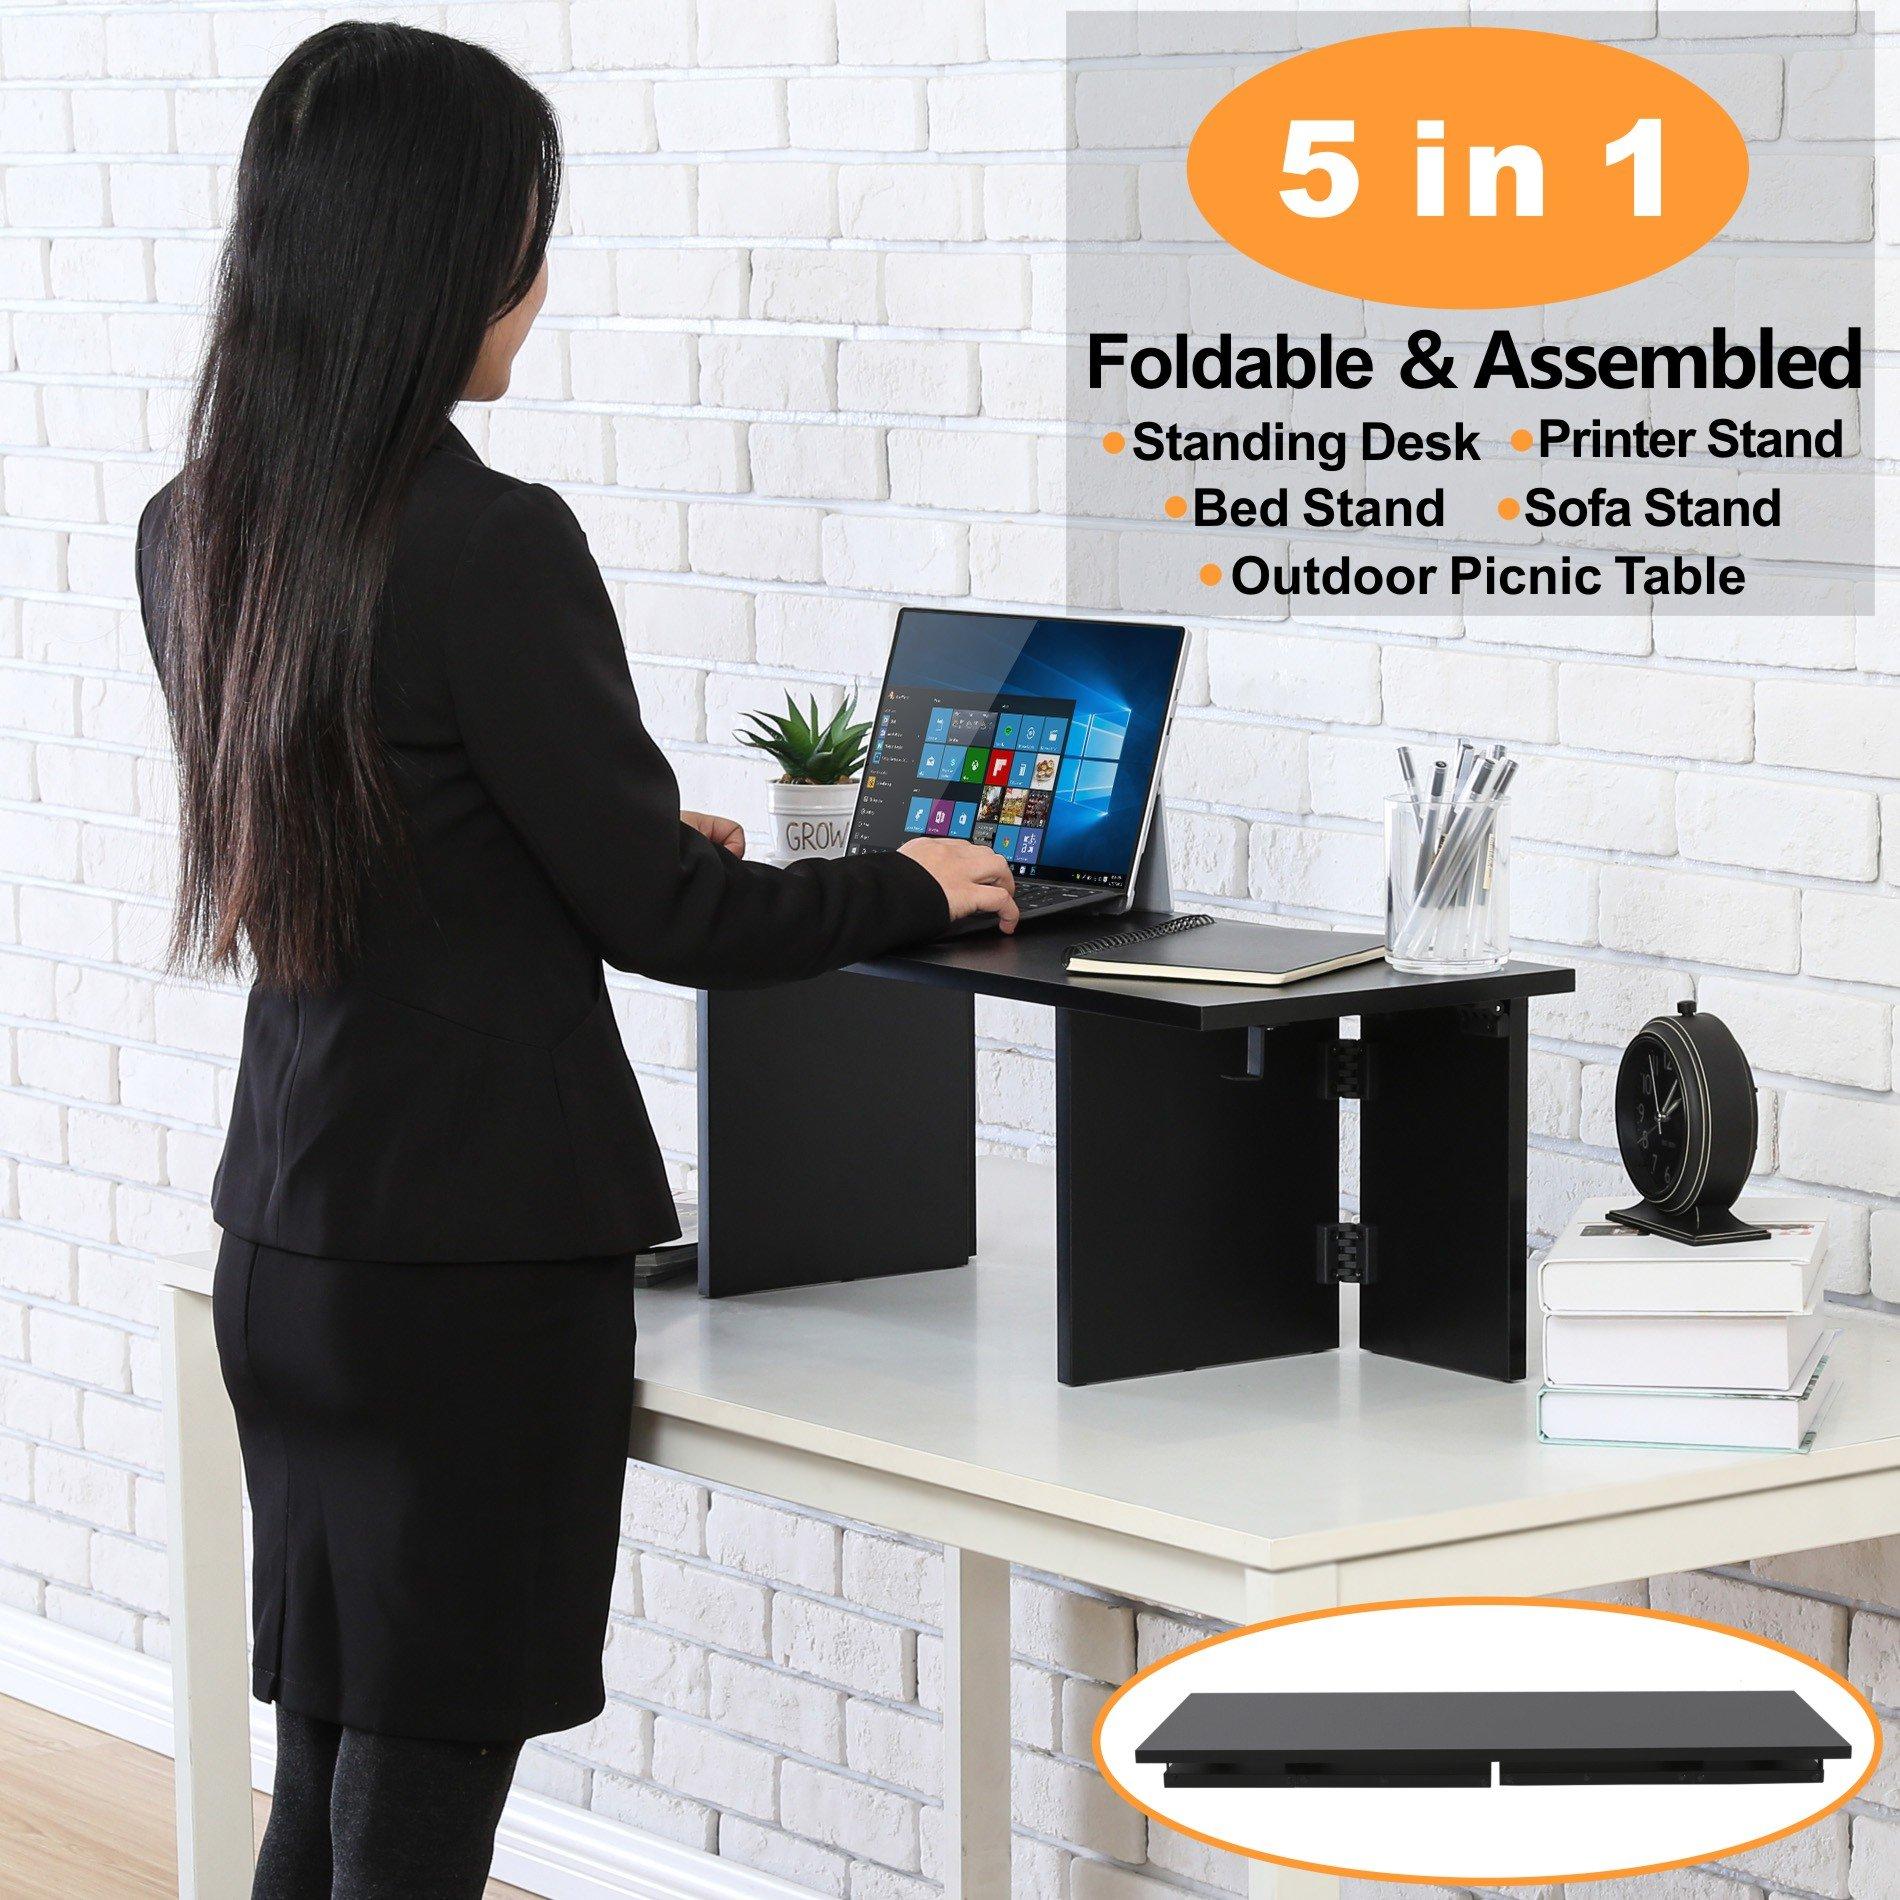 Homury Foldable Wood Speedy Standing Desk Stand Up Desk Sit to Stand Desk Converter Riser Portable Desk for Offices Homes,Black